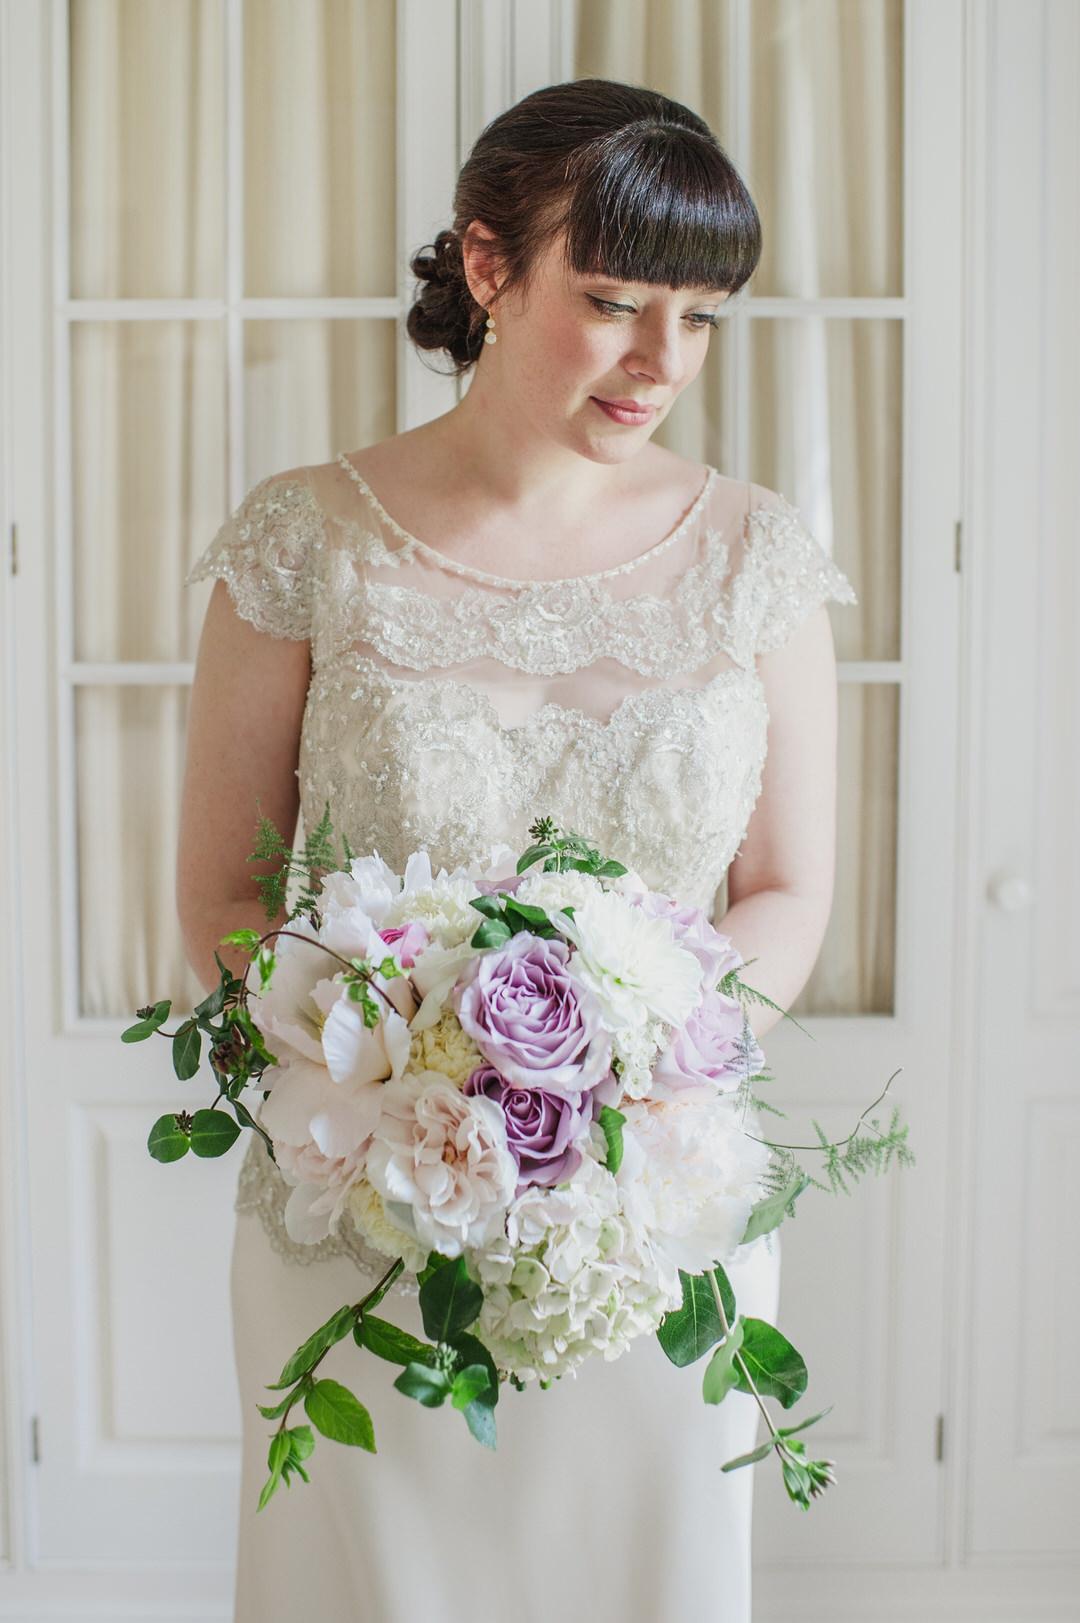 Karen-Flower-Herons-Farm-wedding-1029